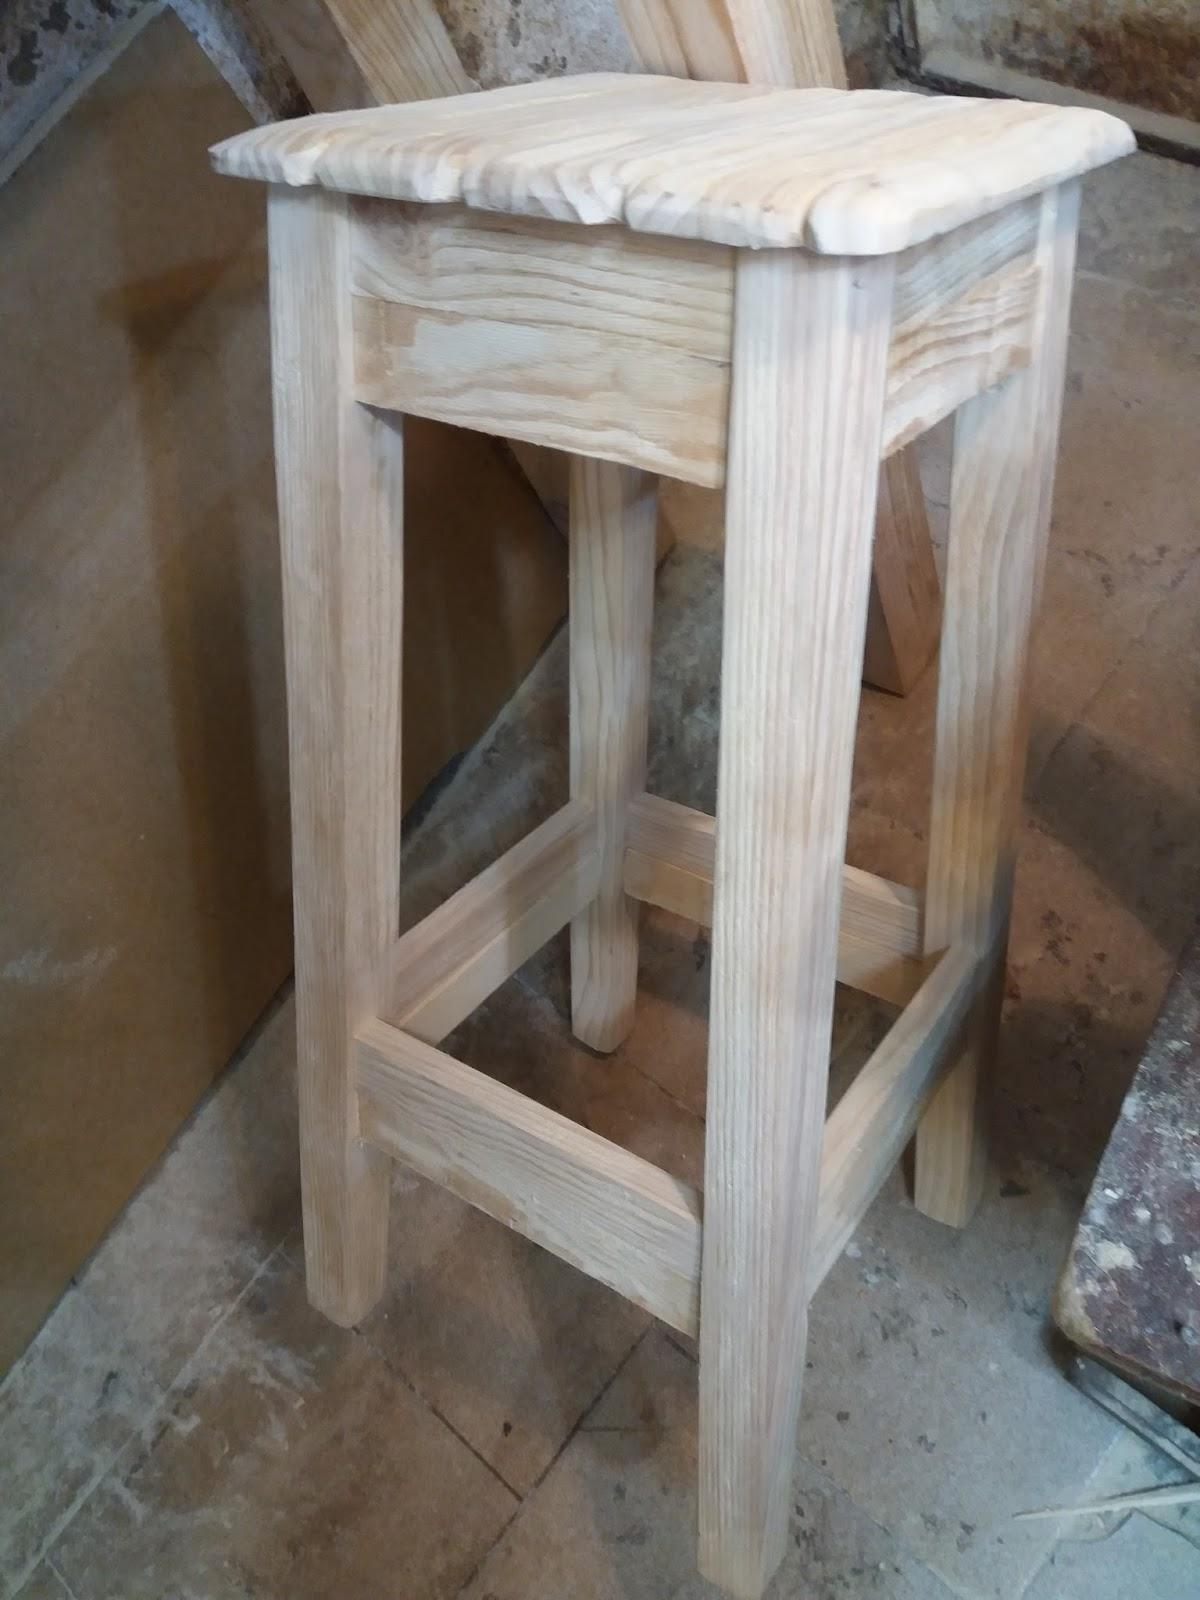 Artesan a r stica en madera - Taburetes rusticos ...